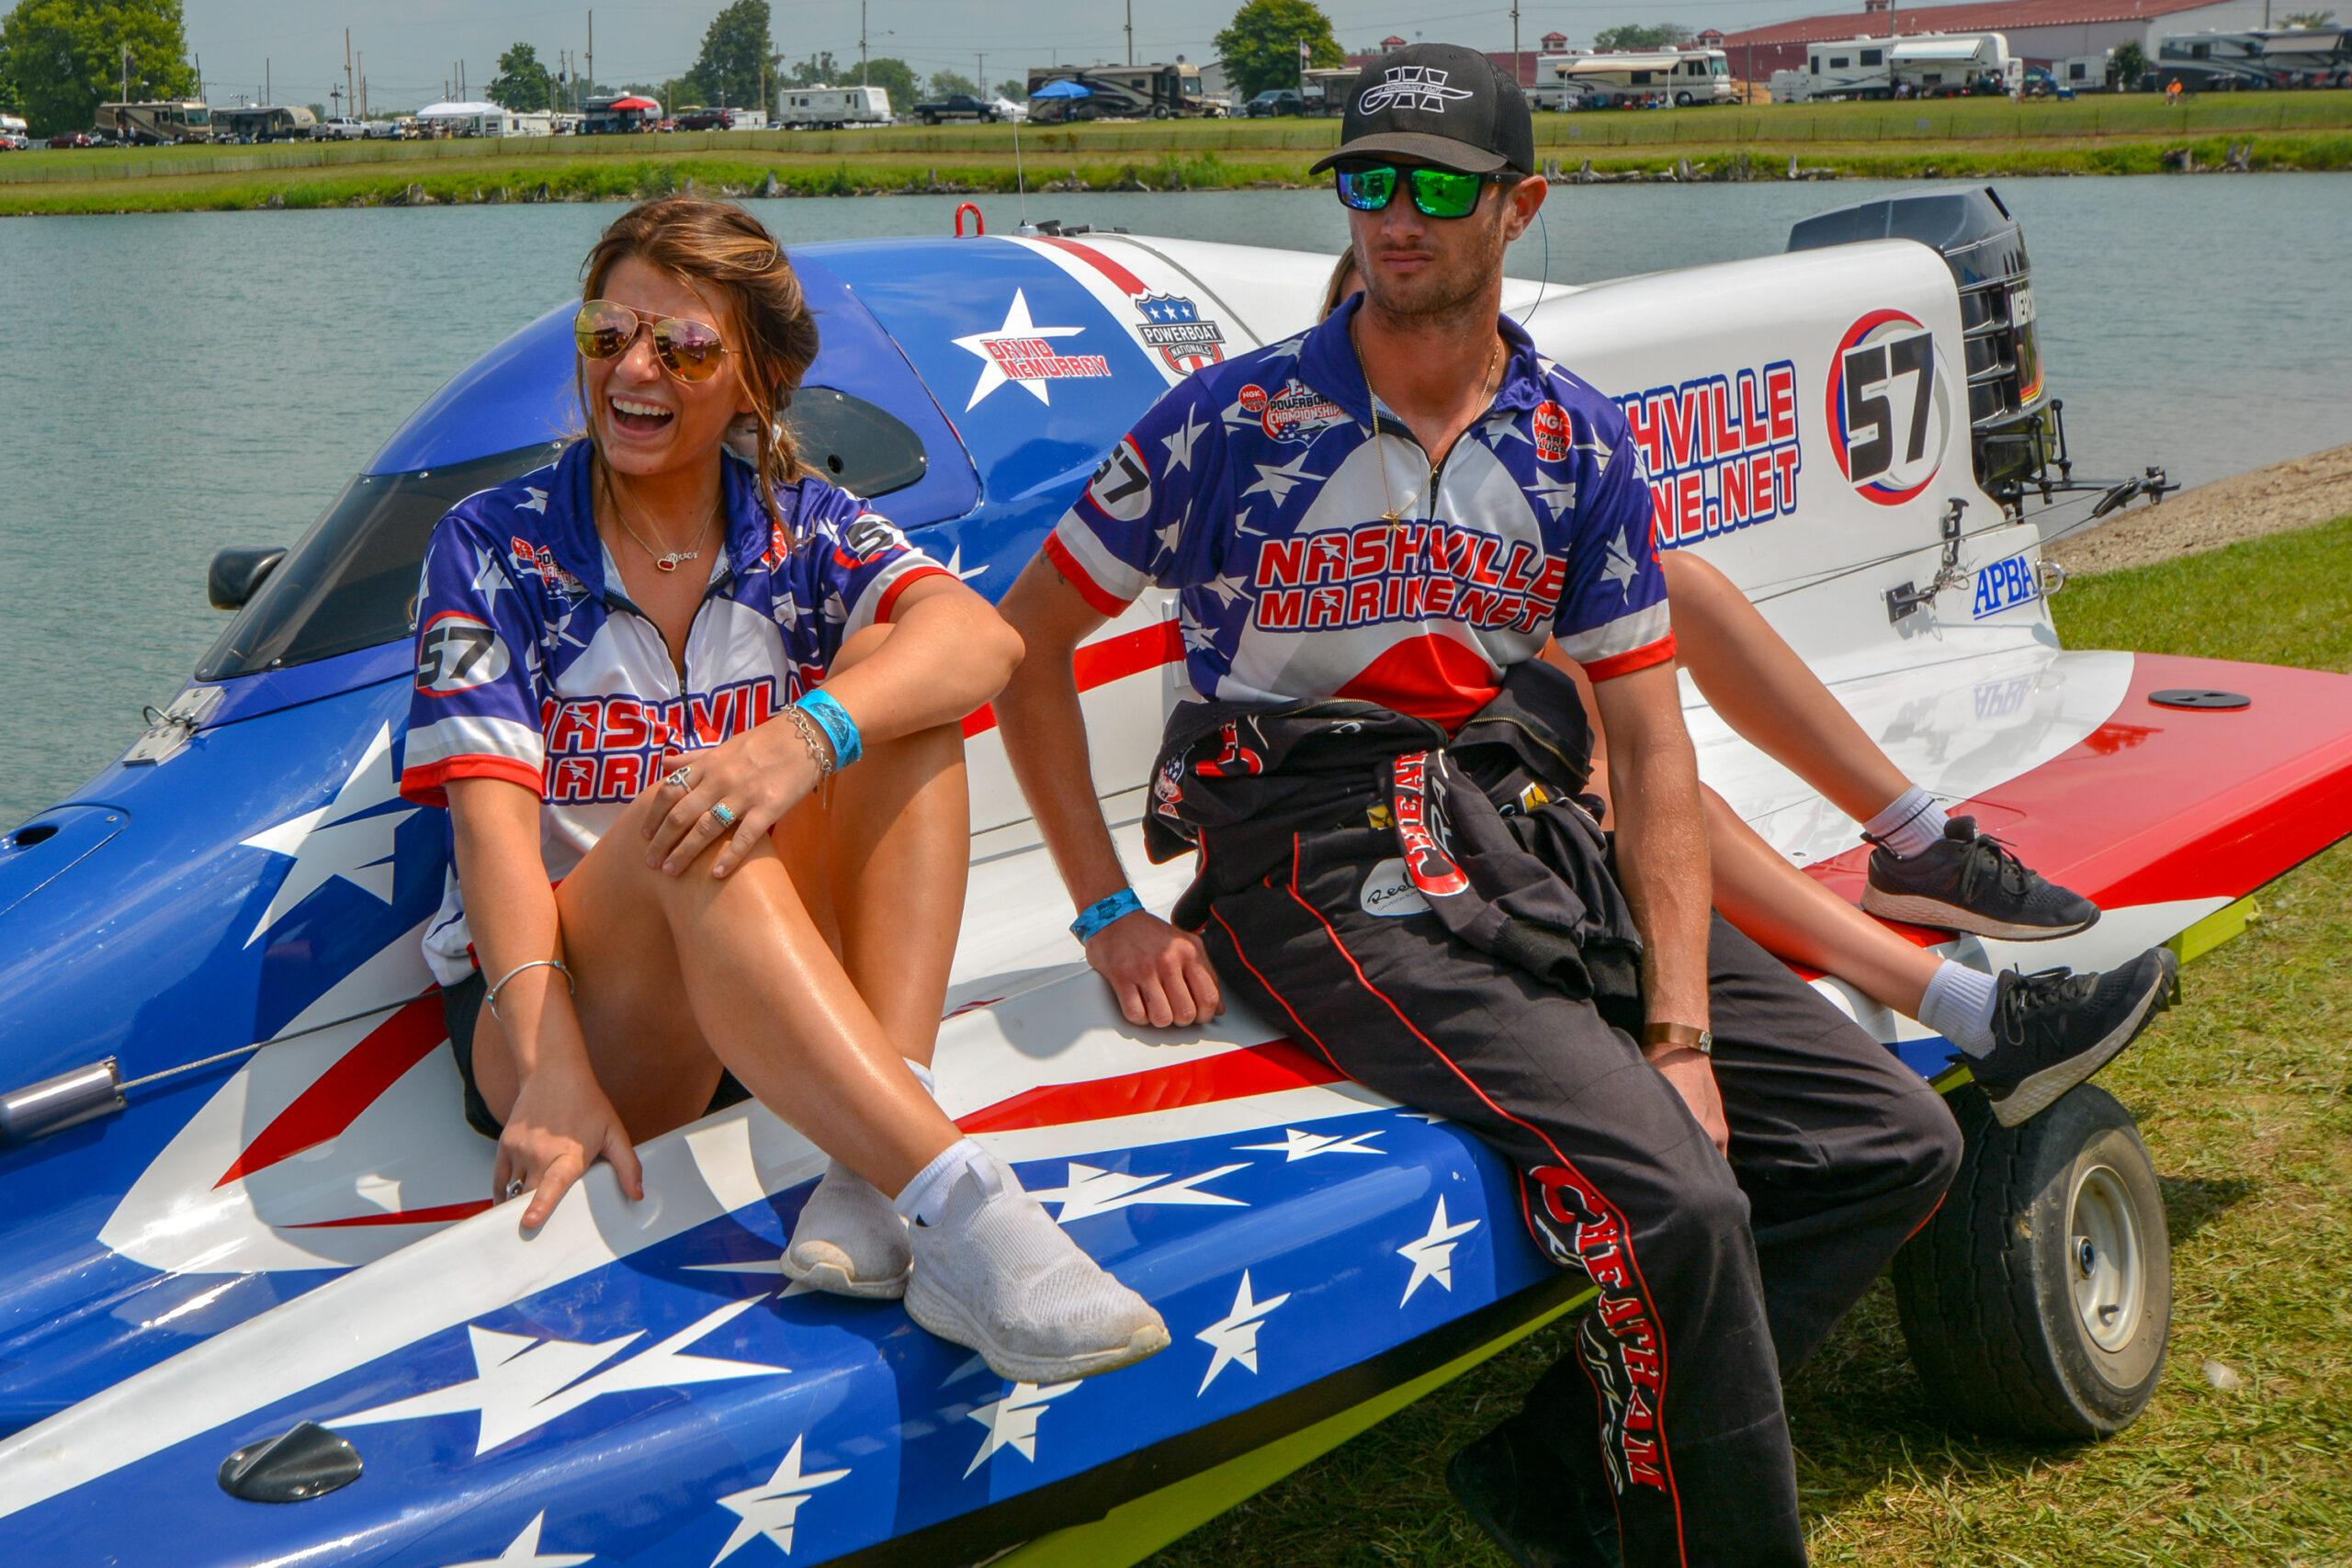 McMurray Racing Nashville Marine 2021 Springfield F1 Race-47